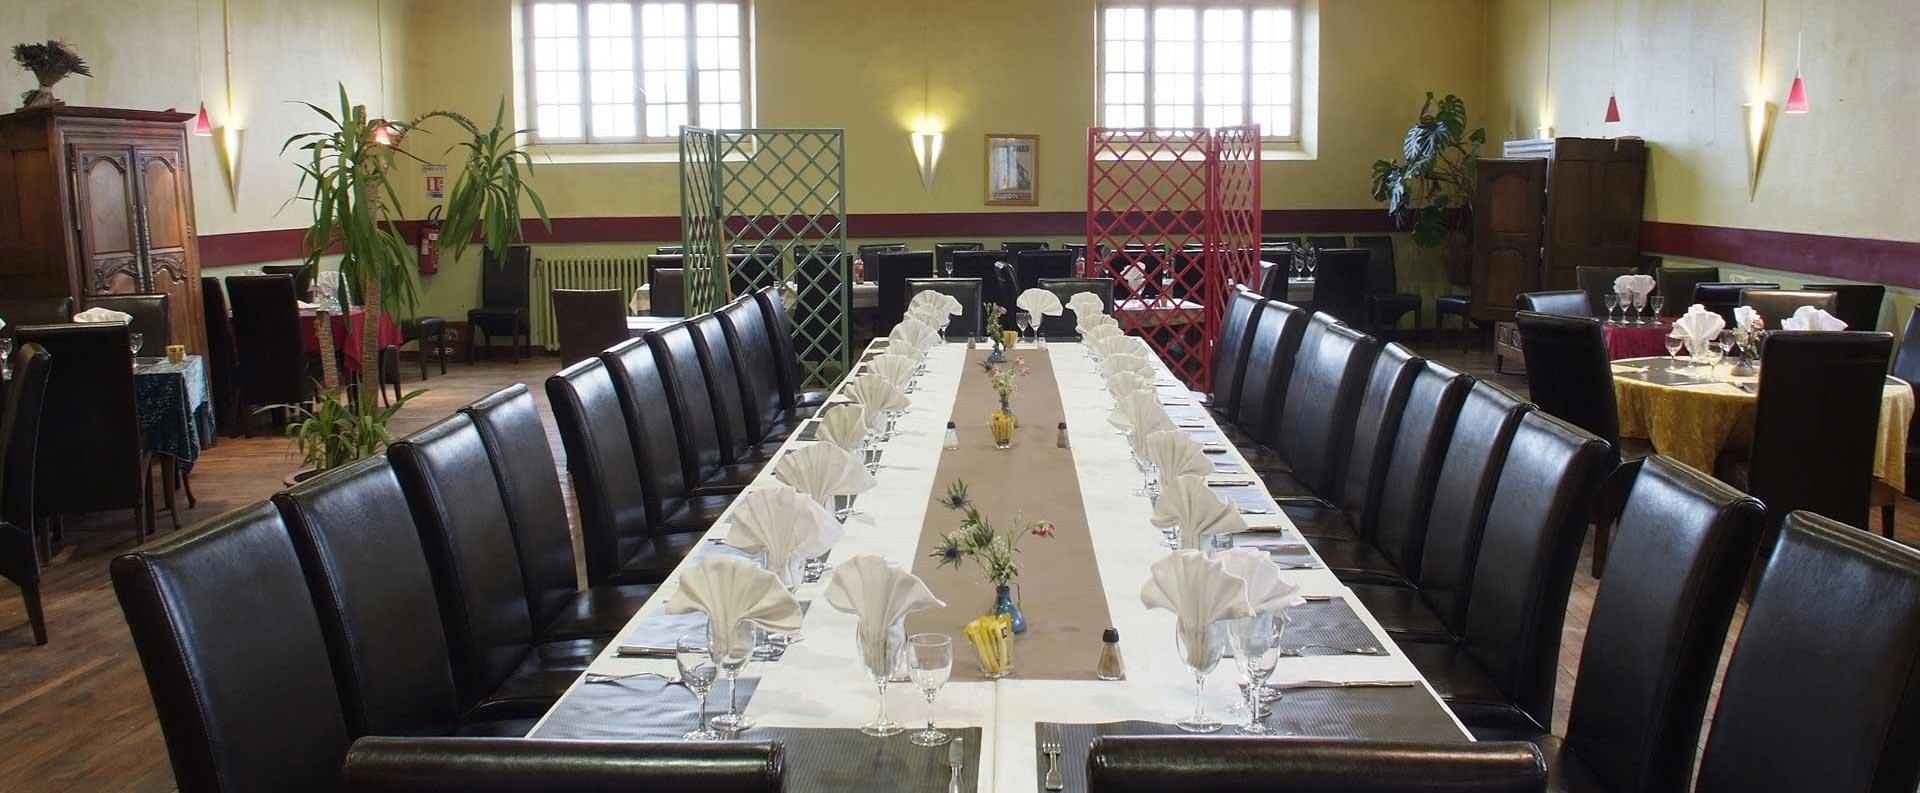 Grande table pour groupe